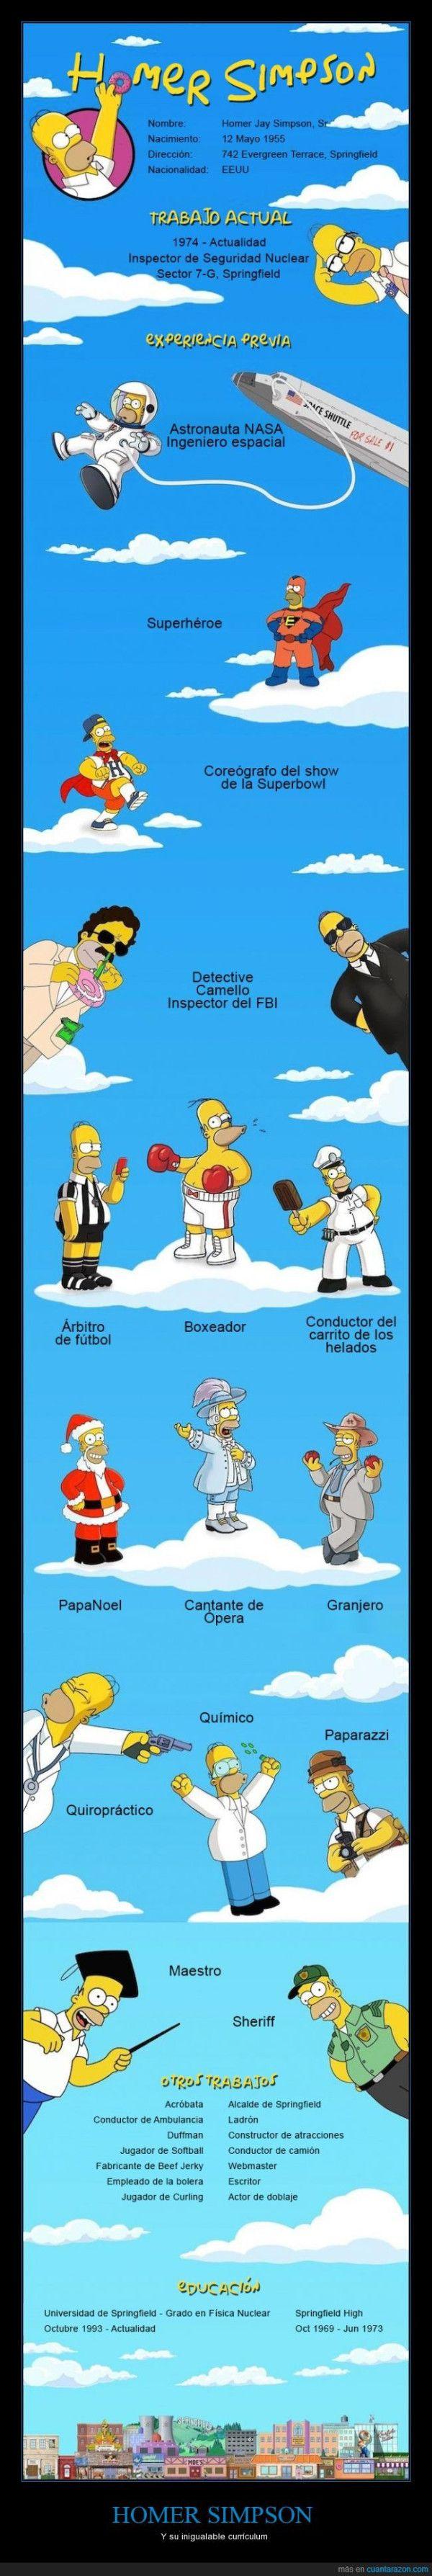 Currículum De Homer Simpson Homero Simpson Imágenes De Los Simpson Personajes De Los Simpsons